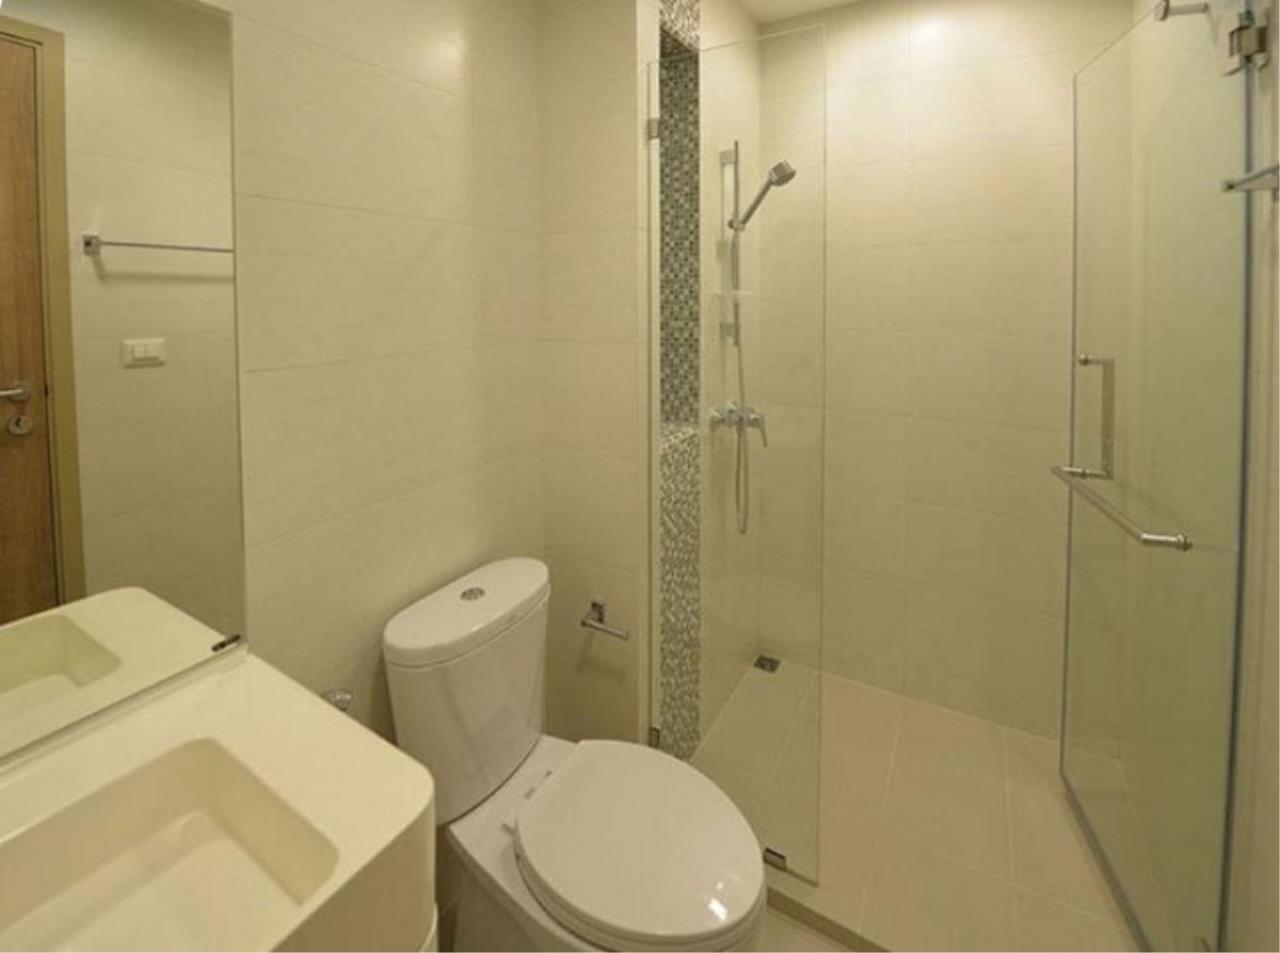 Century21 Skylux Agency's Condolette Midst Rama 9 / Condo For Sale / 1 Bedroom / 29.74 SQM / MRT Phra Ram 9 / Bangkok 5